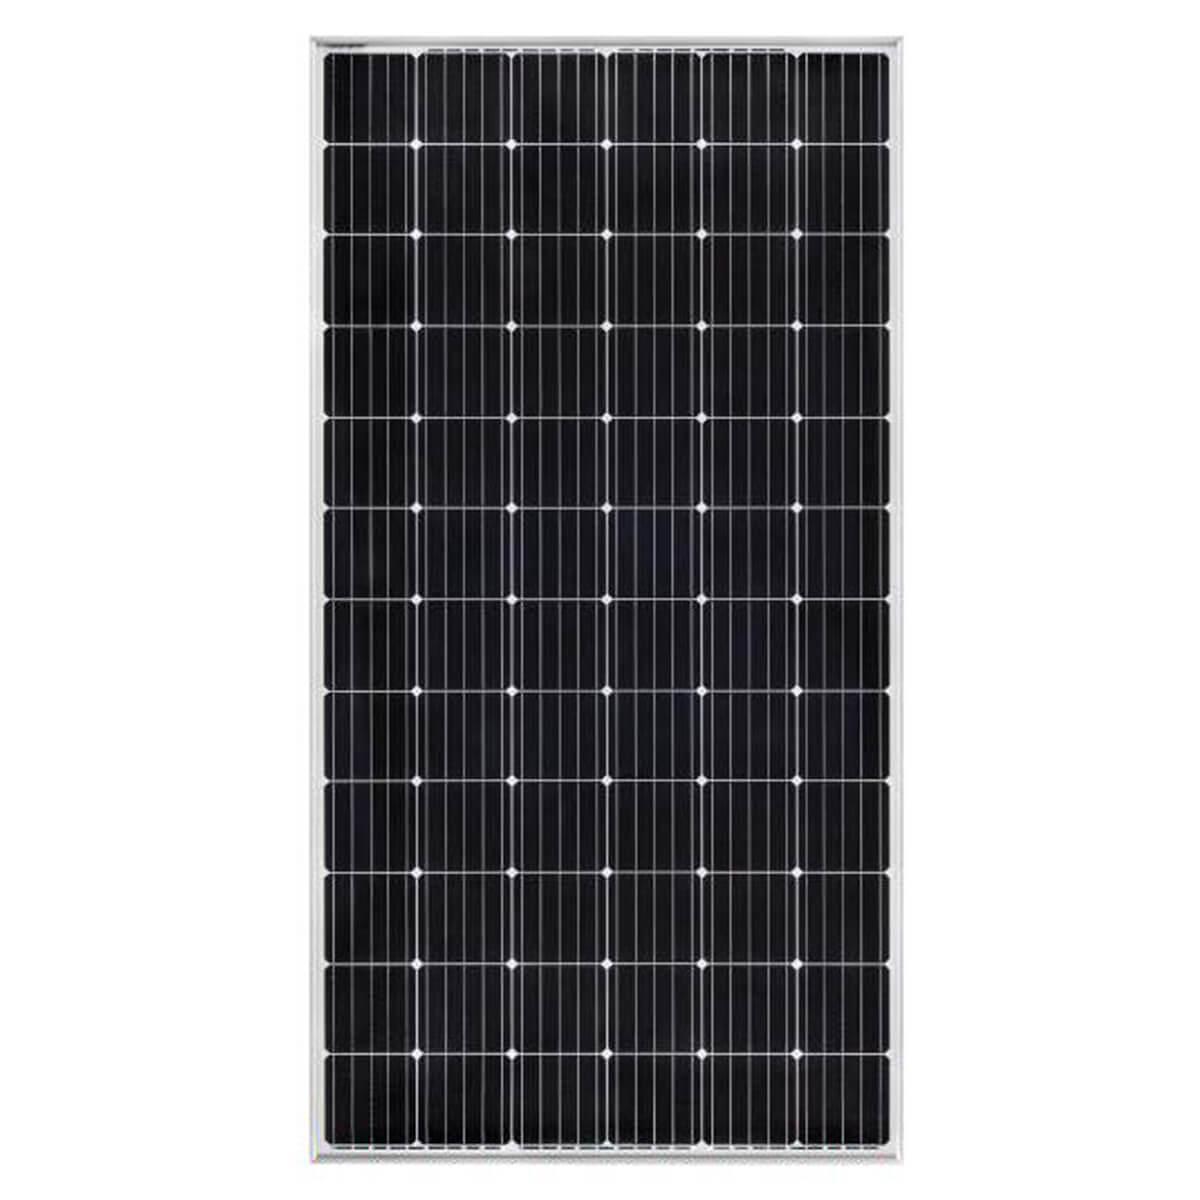 Odul solar 395W panel, odul solar 395Watt panel, Odul solar 395 W panel, odul solar 395 Watt panel, odul solar 395 Watt monokristal panel, Odul solar 395 W watt gunes paneli, odul solar 395 W watt monokristal gunes paneli, odul solar 395 W Watt fotovoltaik monokristal solar panel, odul solar 395W monokristal gunes enerjisi, odul solar OSMp72-395W panel, ÖDÜL SOLAR 395 WATT